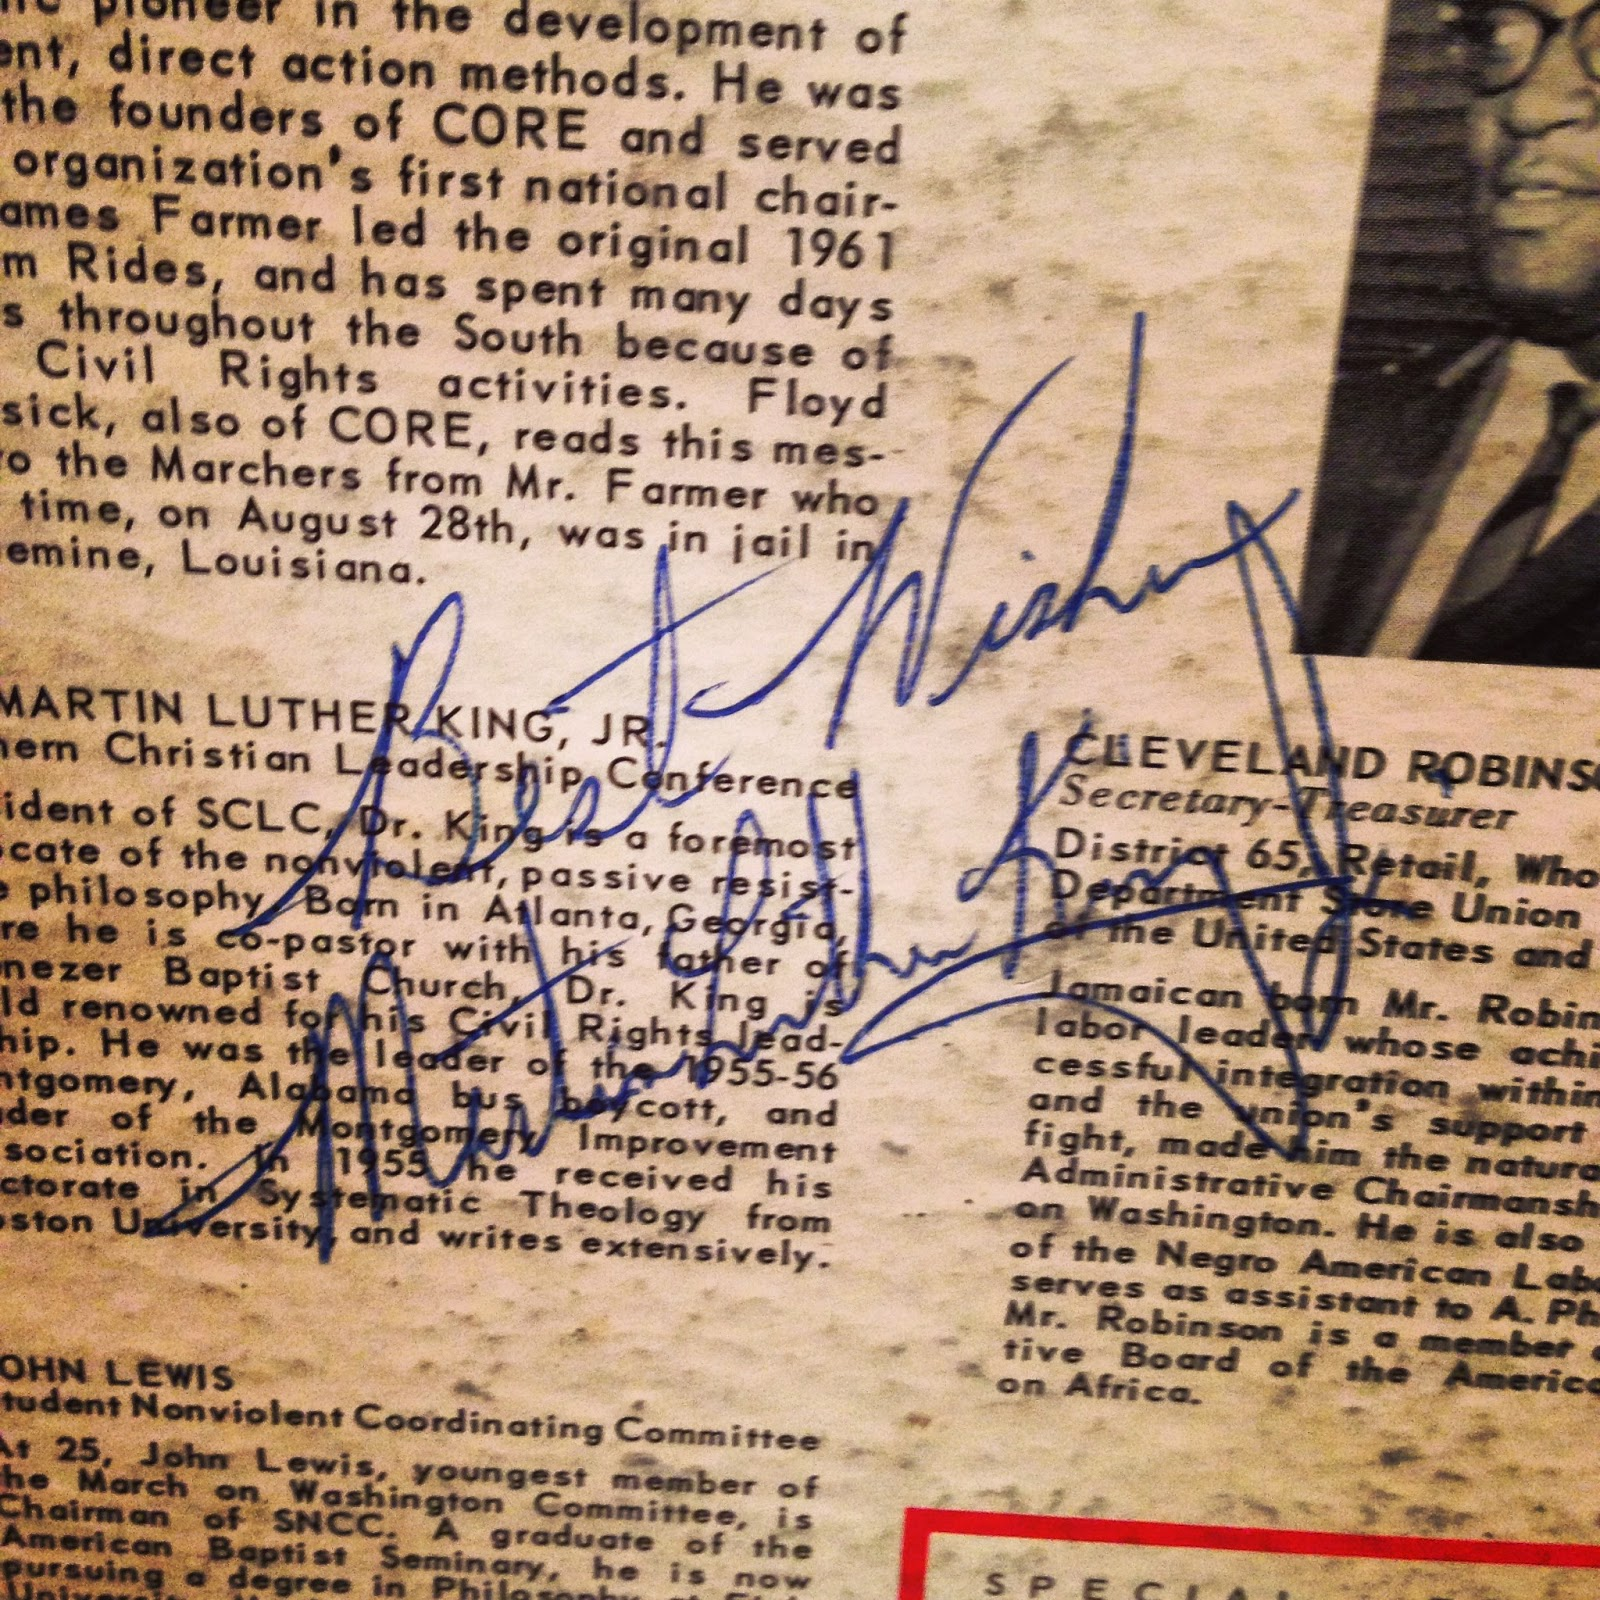 Martin Luther King, Jr. Signature.jpg